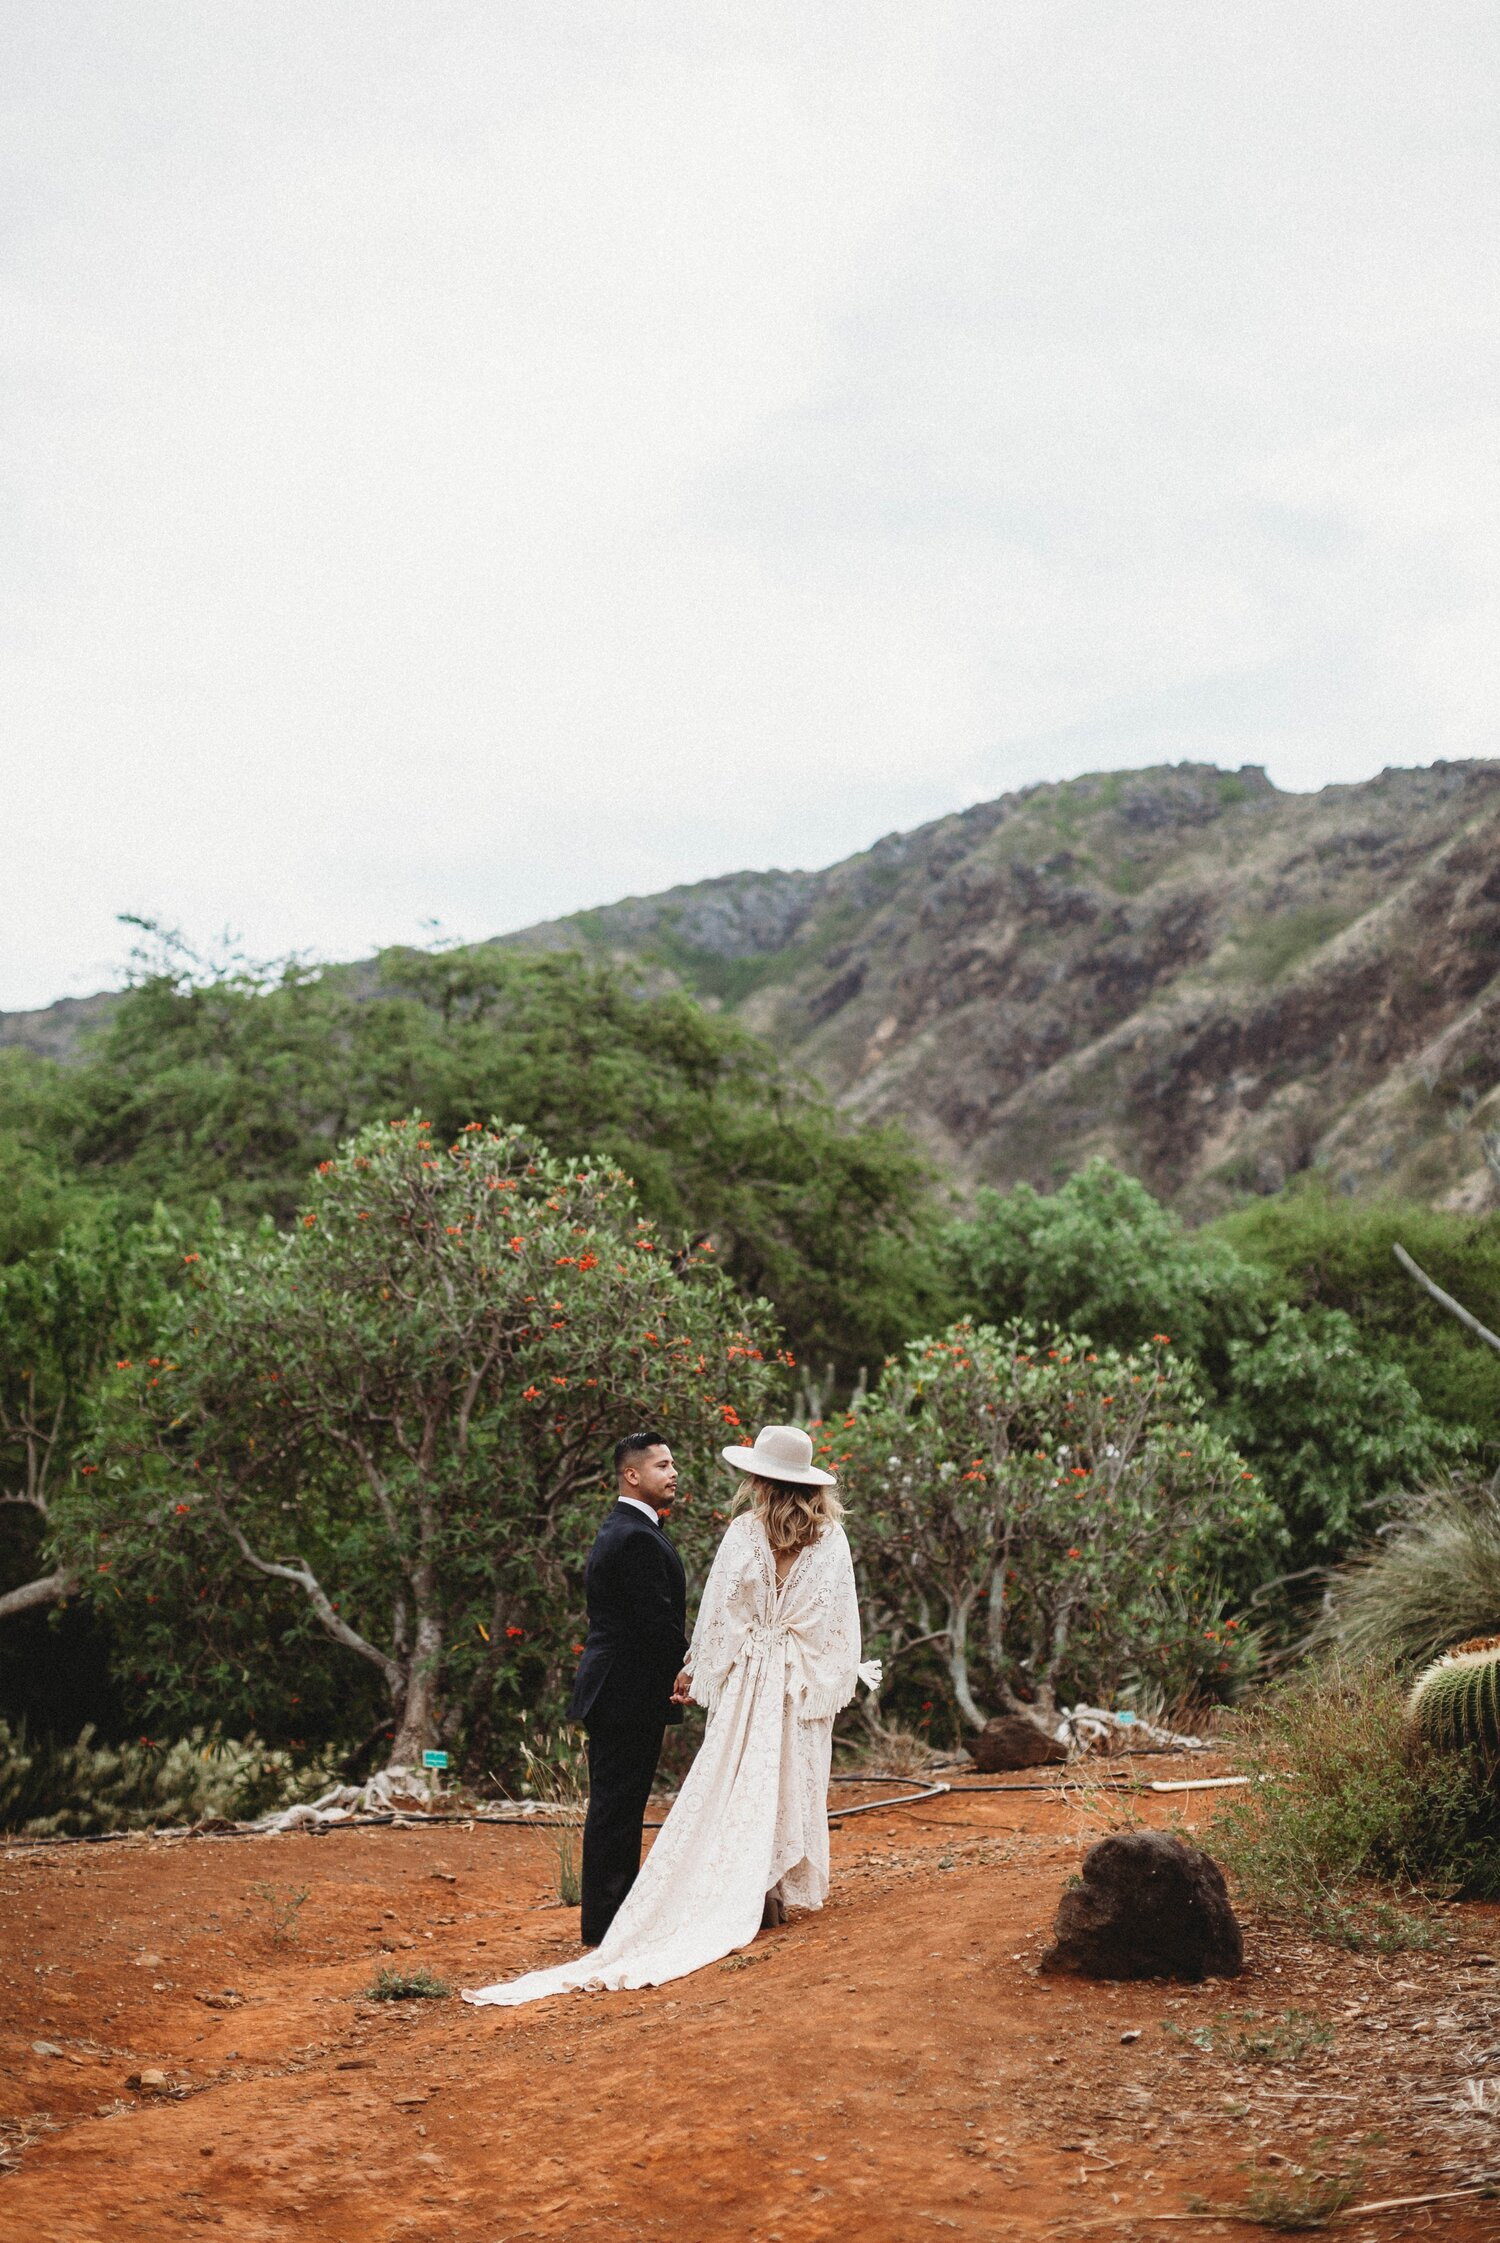 Boho Cactus Elopement - Honolulu, Koko Crater Botanical Garden - Oahu Hawaii Wedding Photographer 13.jpg